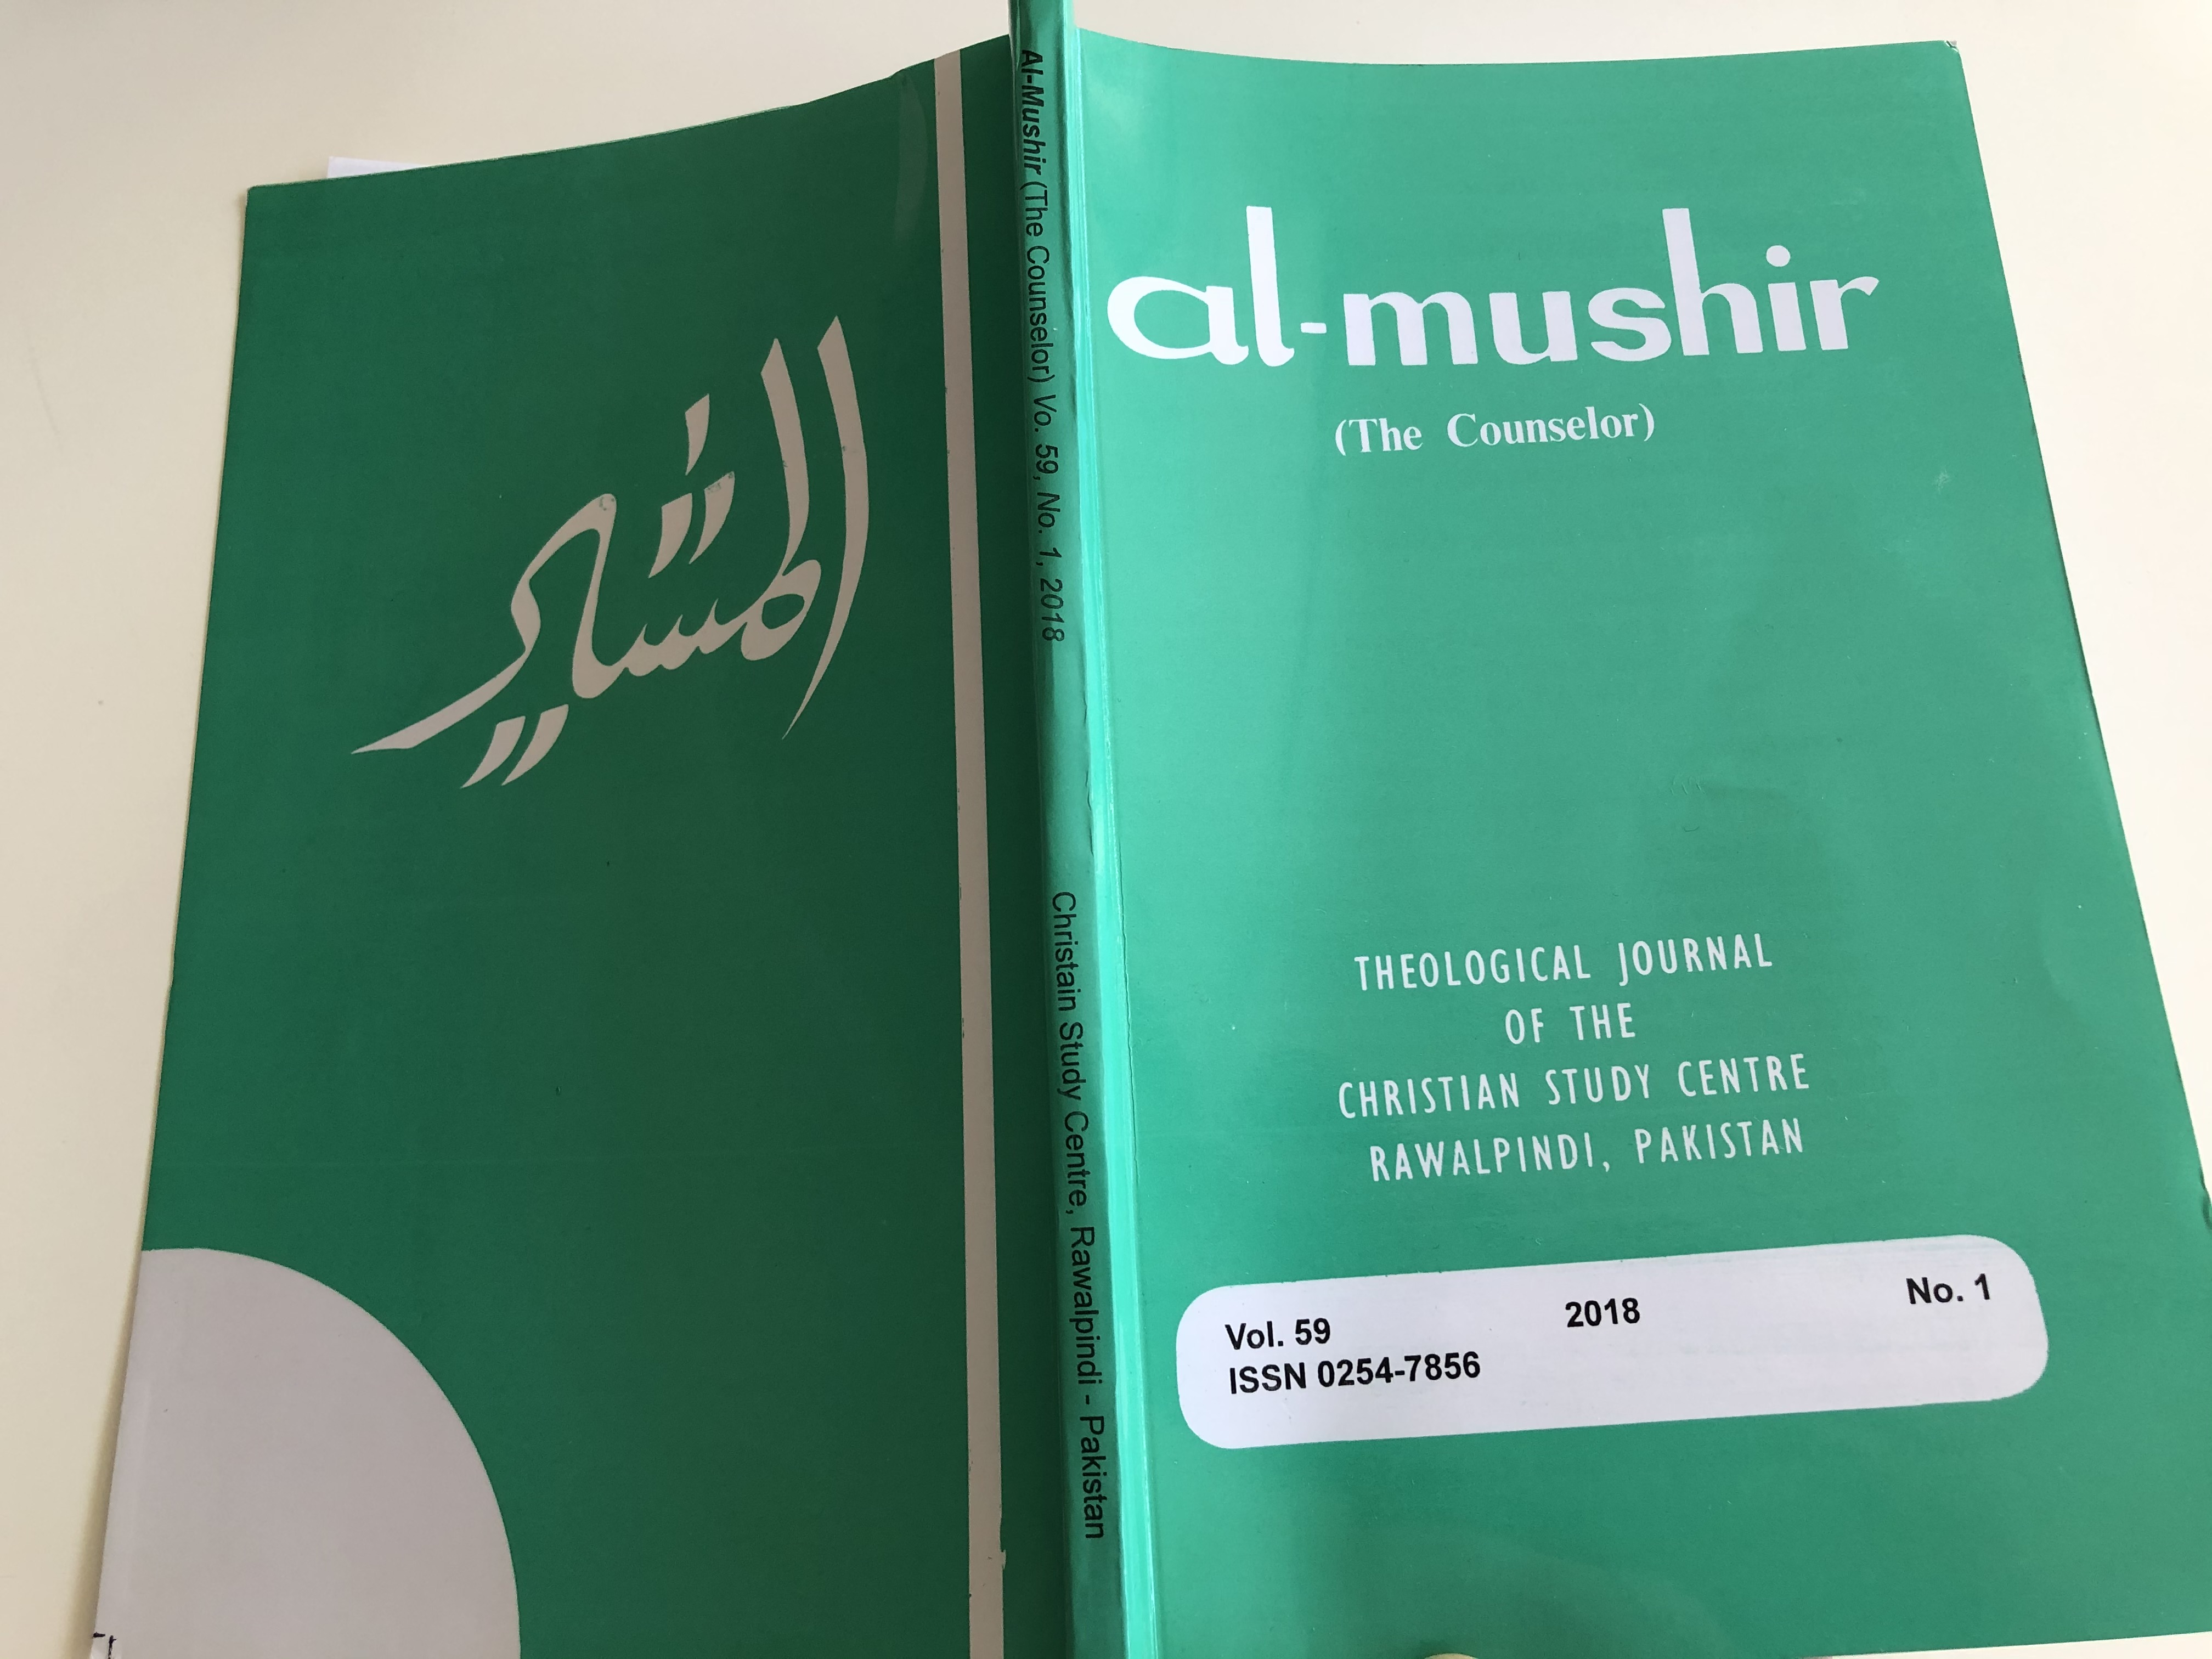 al-mushir-the-counselor-volume-59.-no.-1-12.jpg